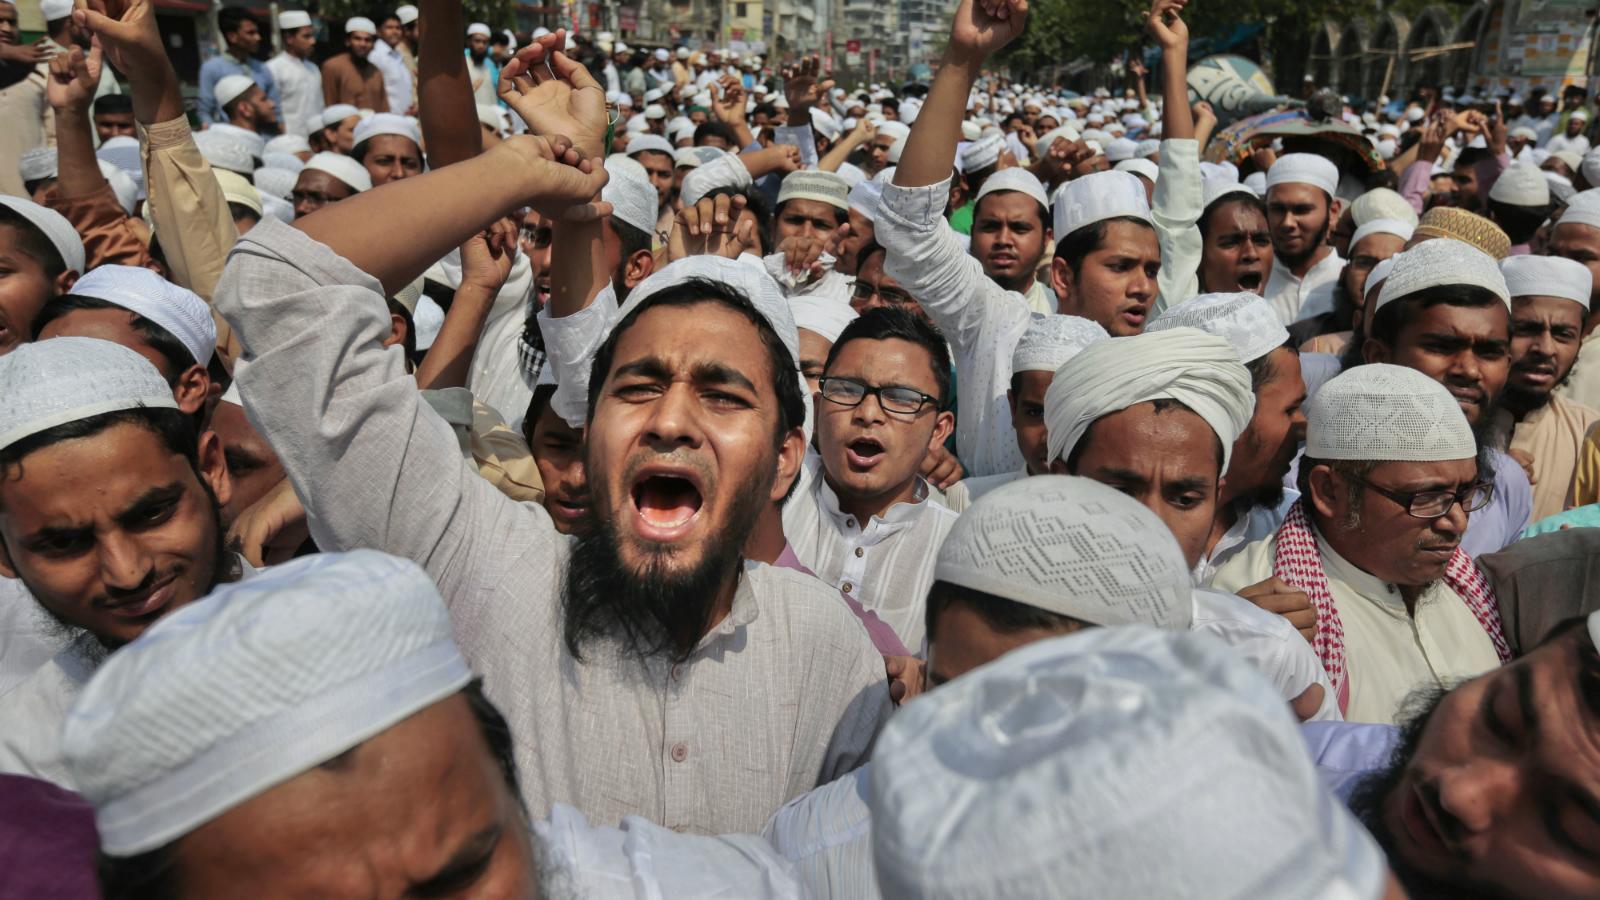 Bangladesh-Death-Freedom-Rational-Hacked